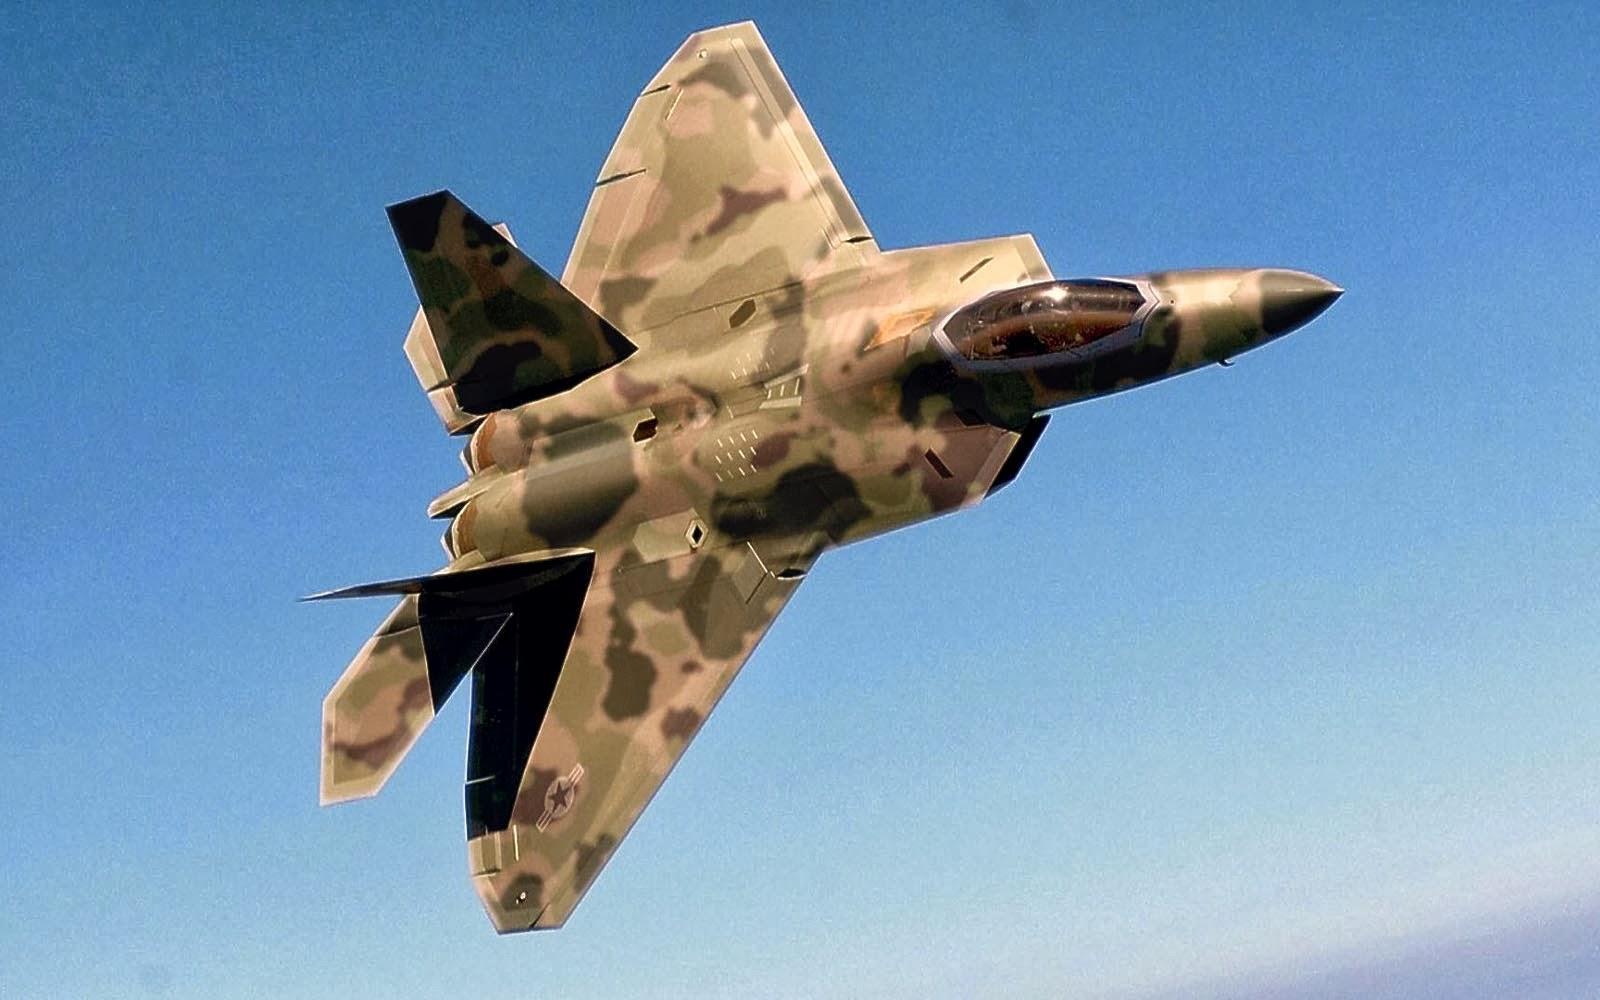 wallpapers Lockheed Martin F 22 Raptor Wallpapers 1600x1000